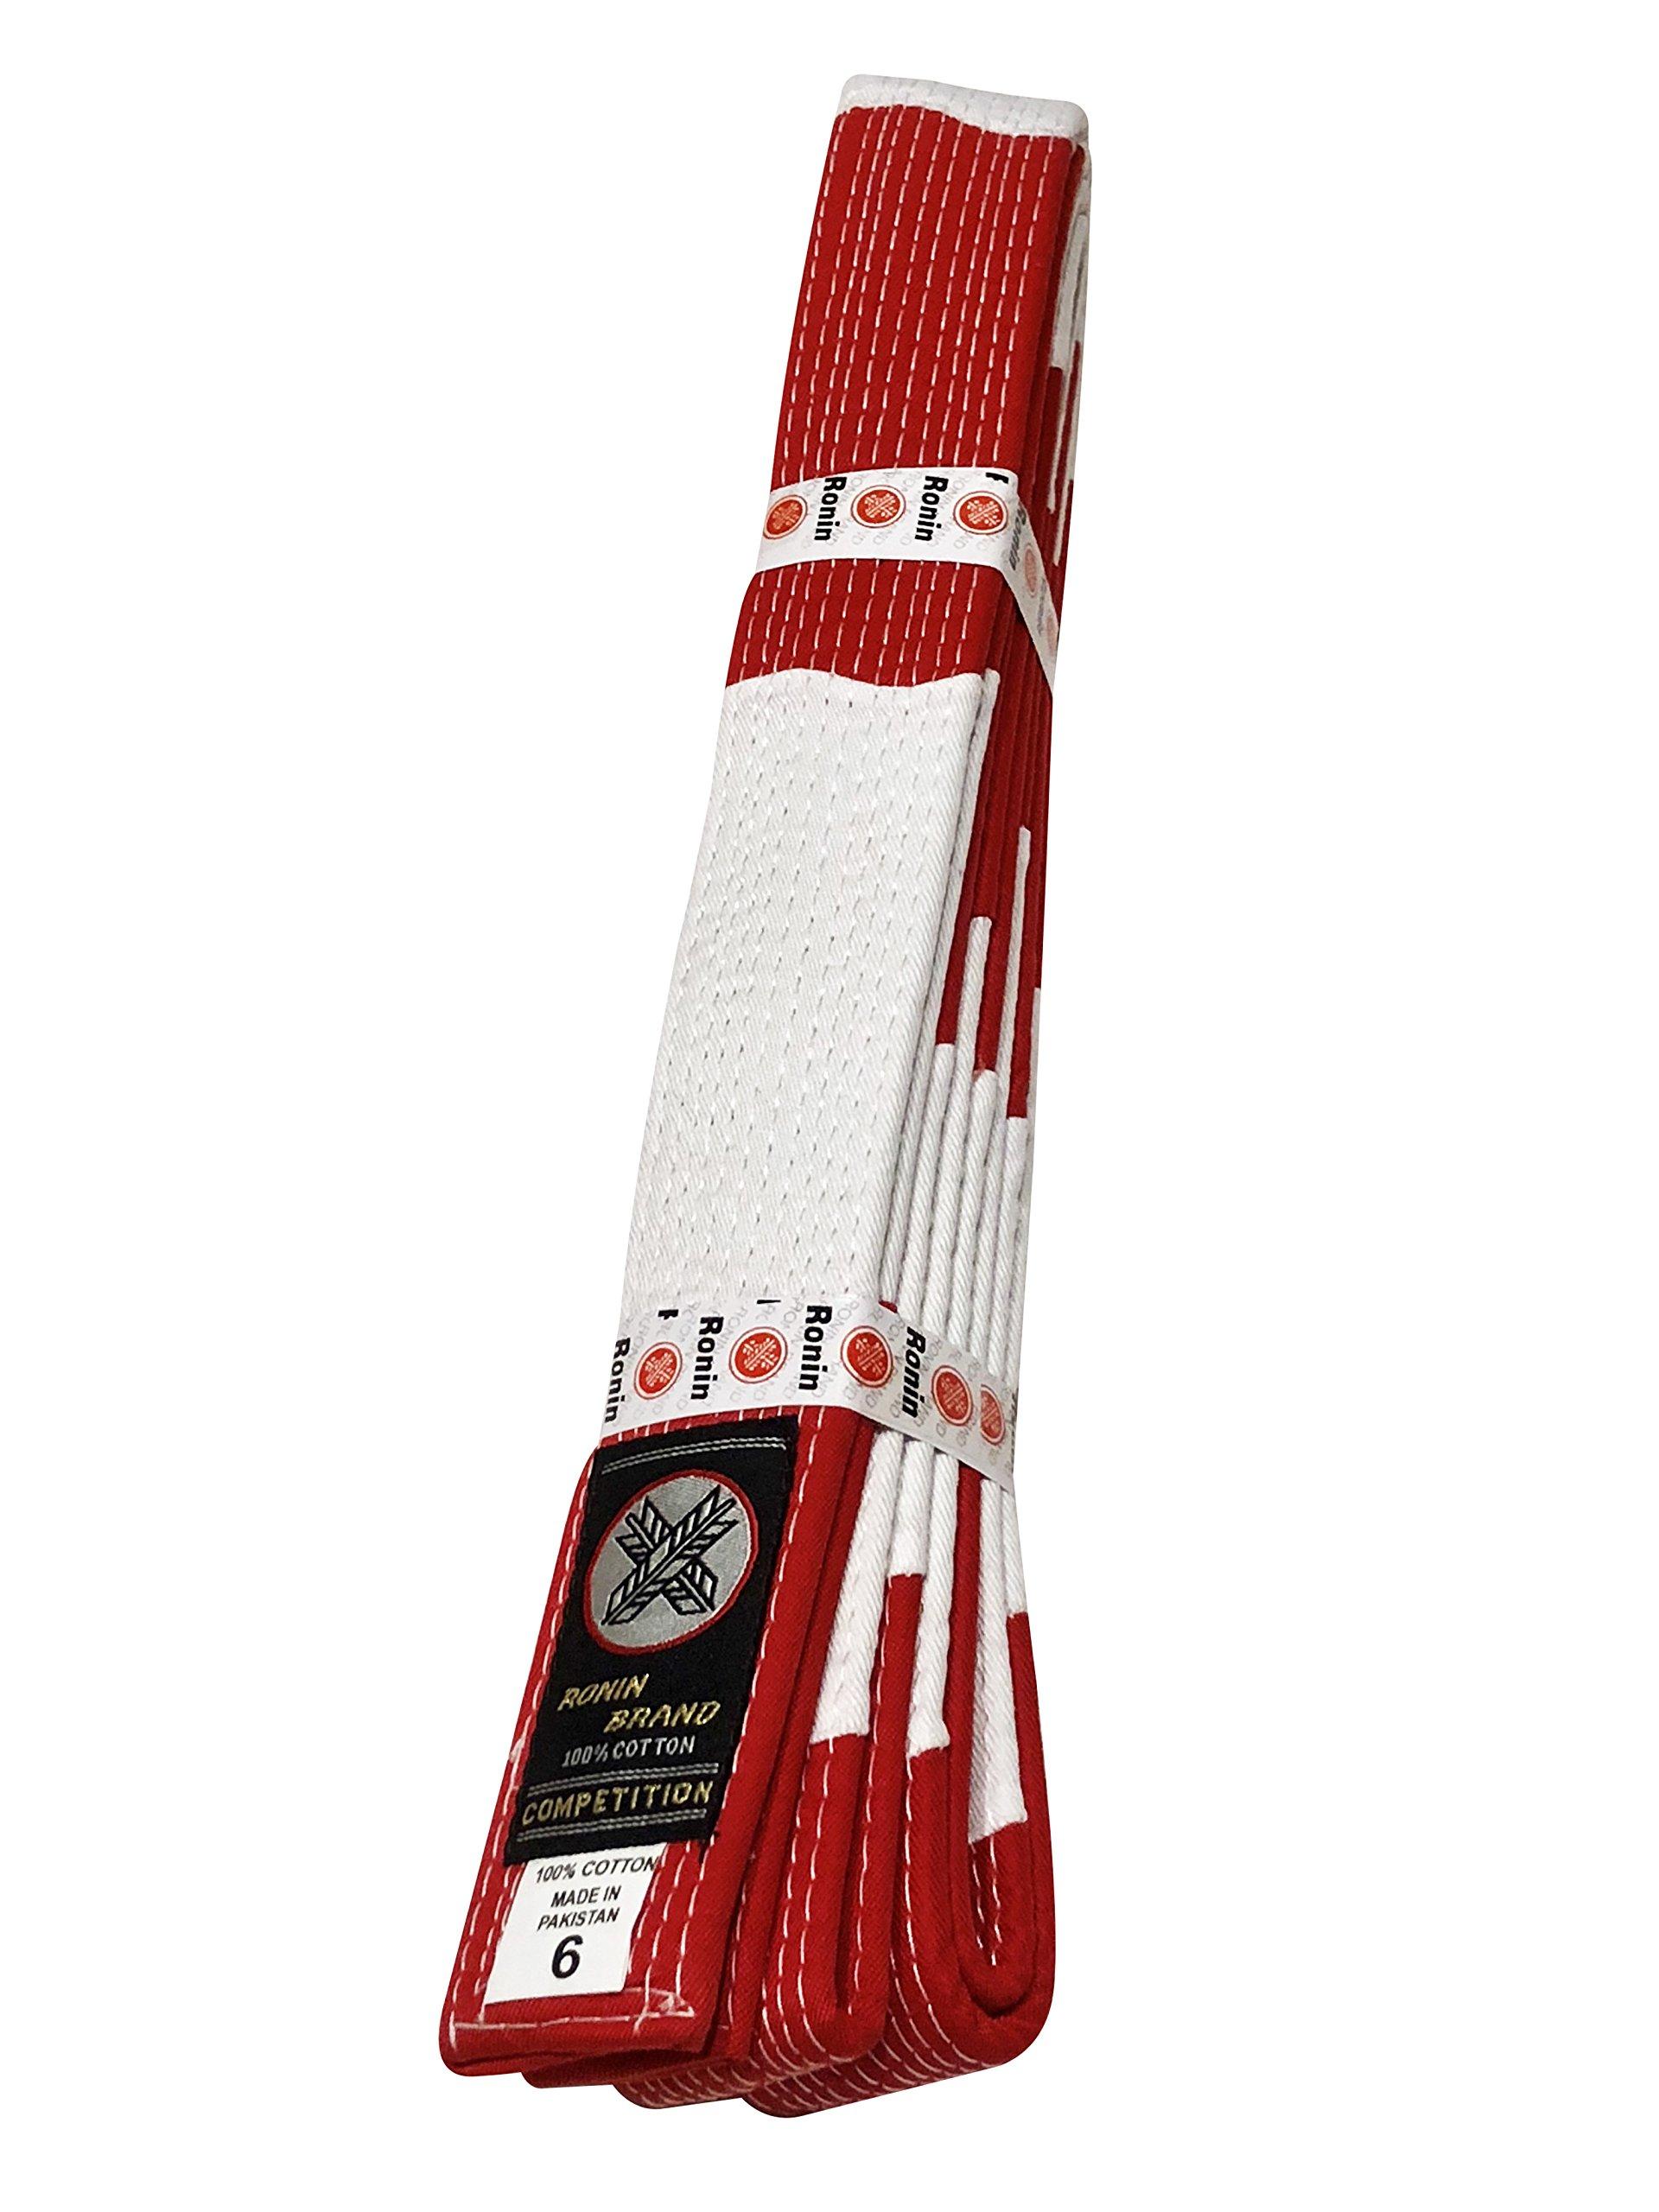 Rokudan Martial Arts Masters Rank Belt. Sixth & Seventh Degree Rank for Karate, Judo & Jujitsu. ... (5) by Ronin Brand